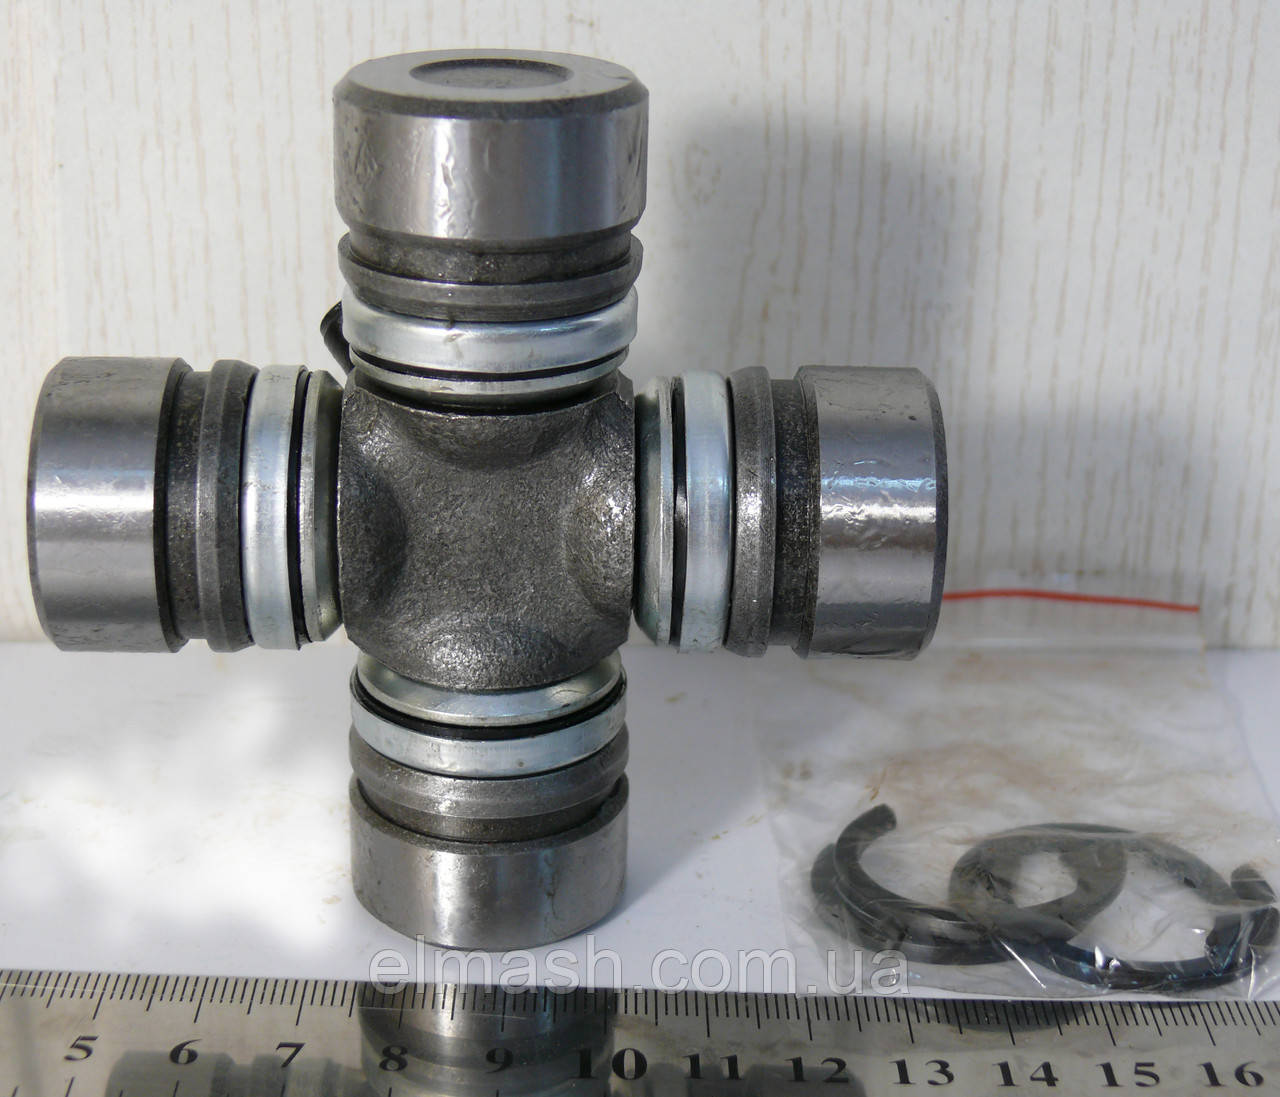 Крестовина вала карданного ГАЗ 2410, 31029 (со стопорными кольцами) Стандарт (пр-во ГАЗ)